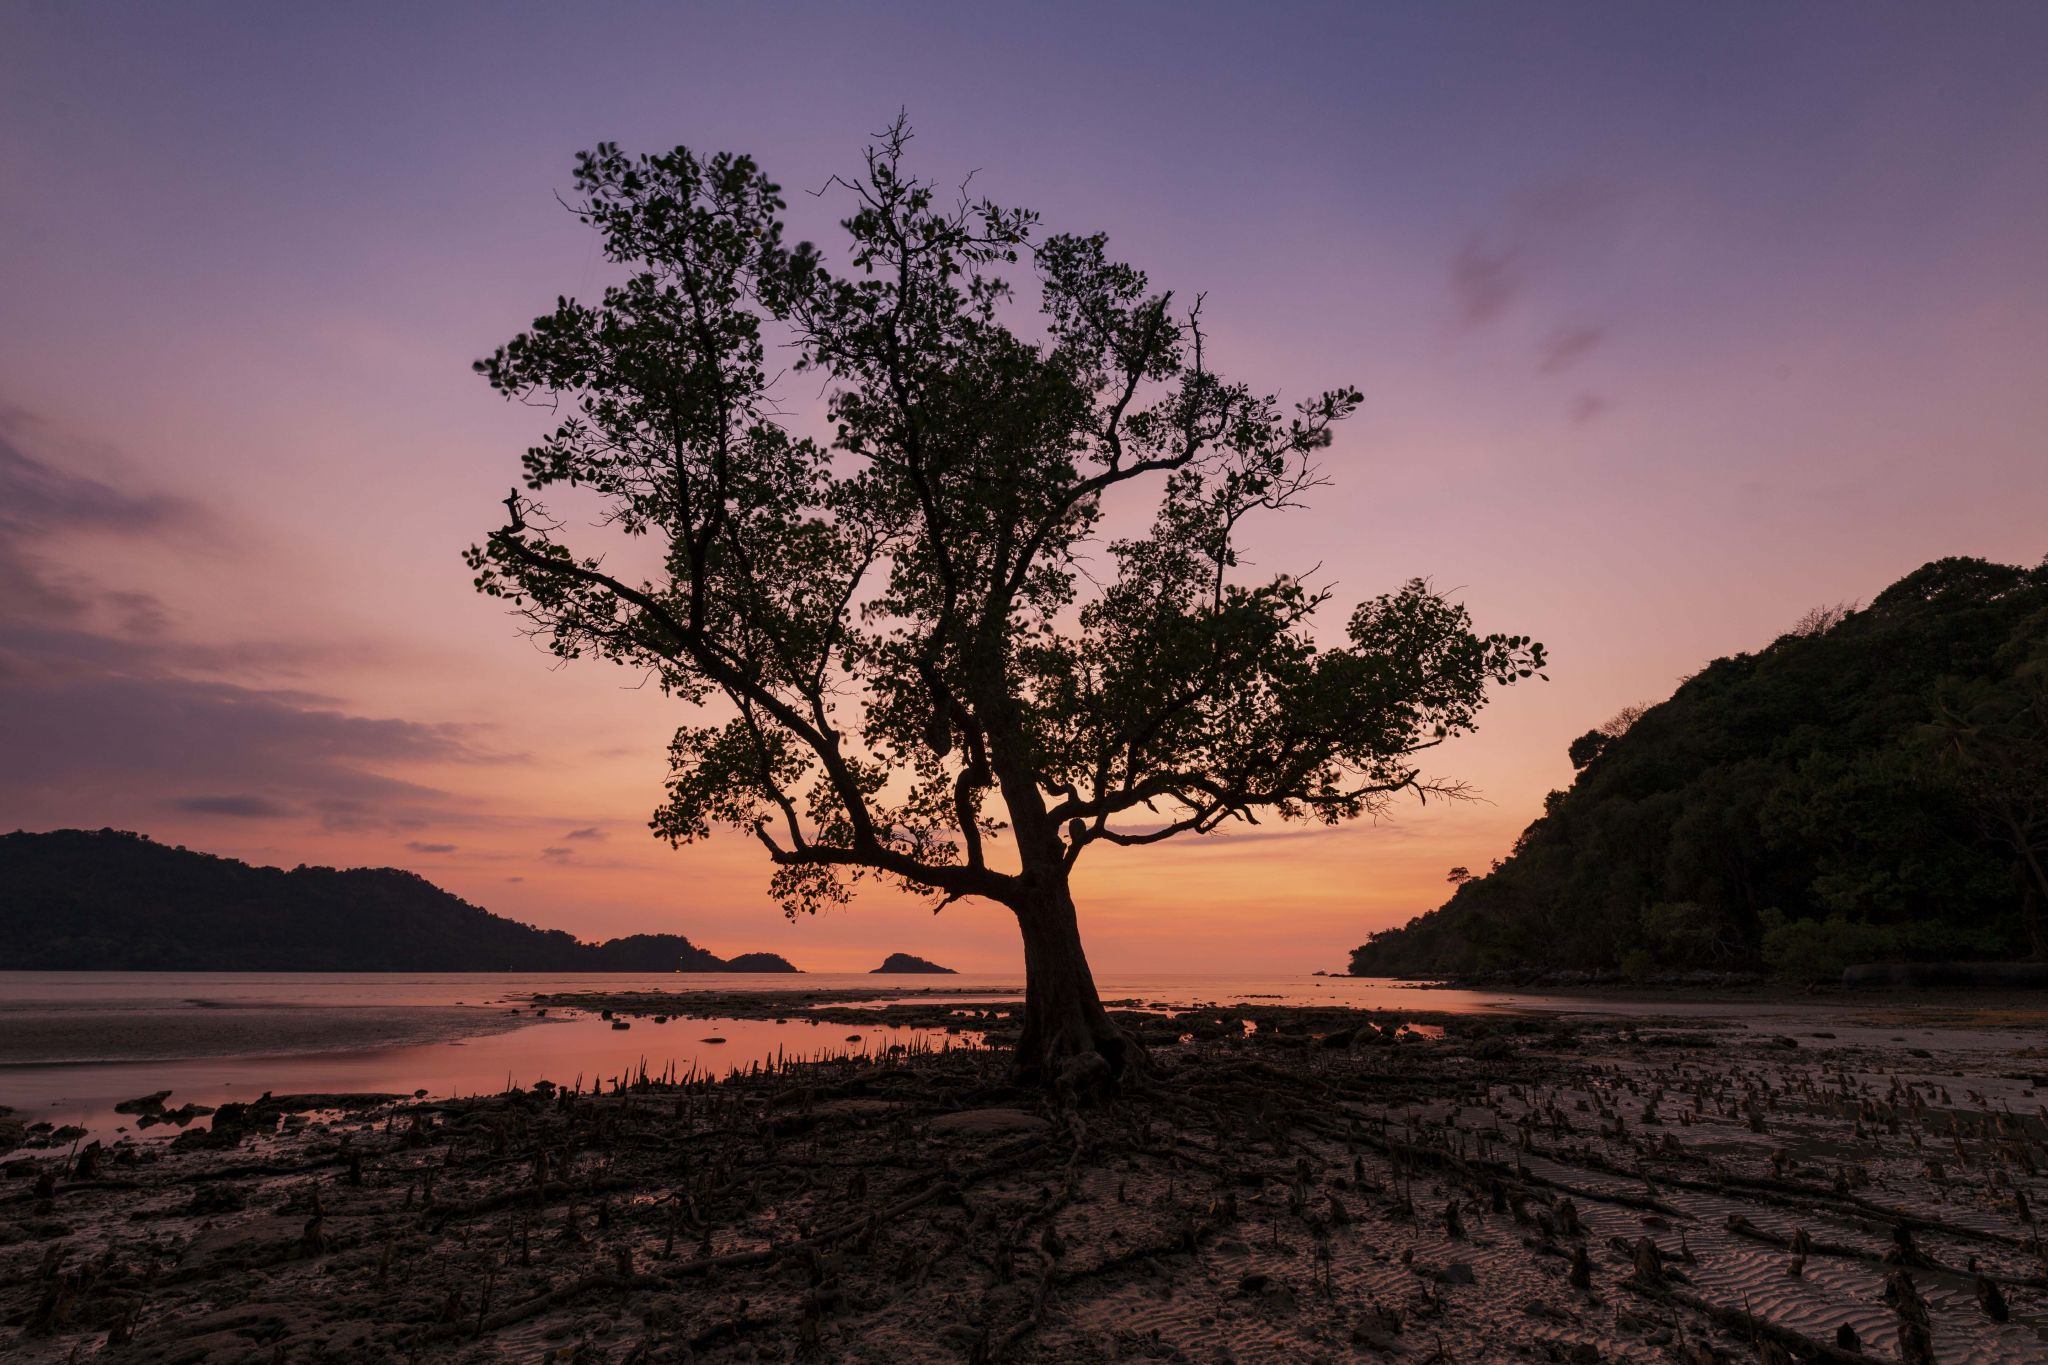 Sunset Tree, Thailand